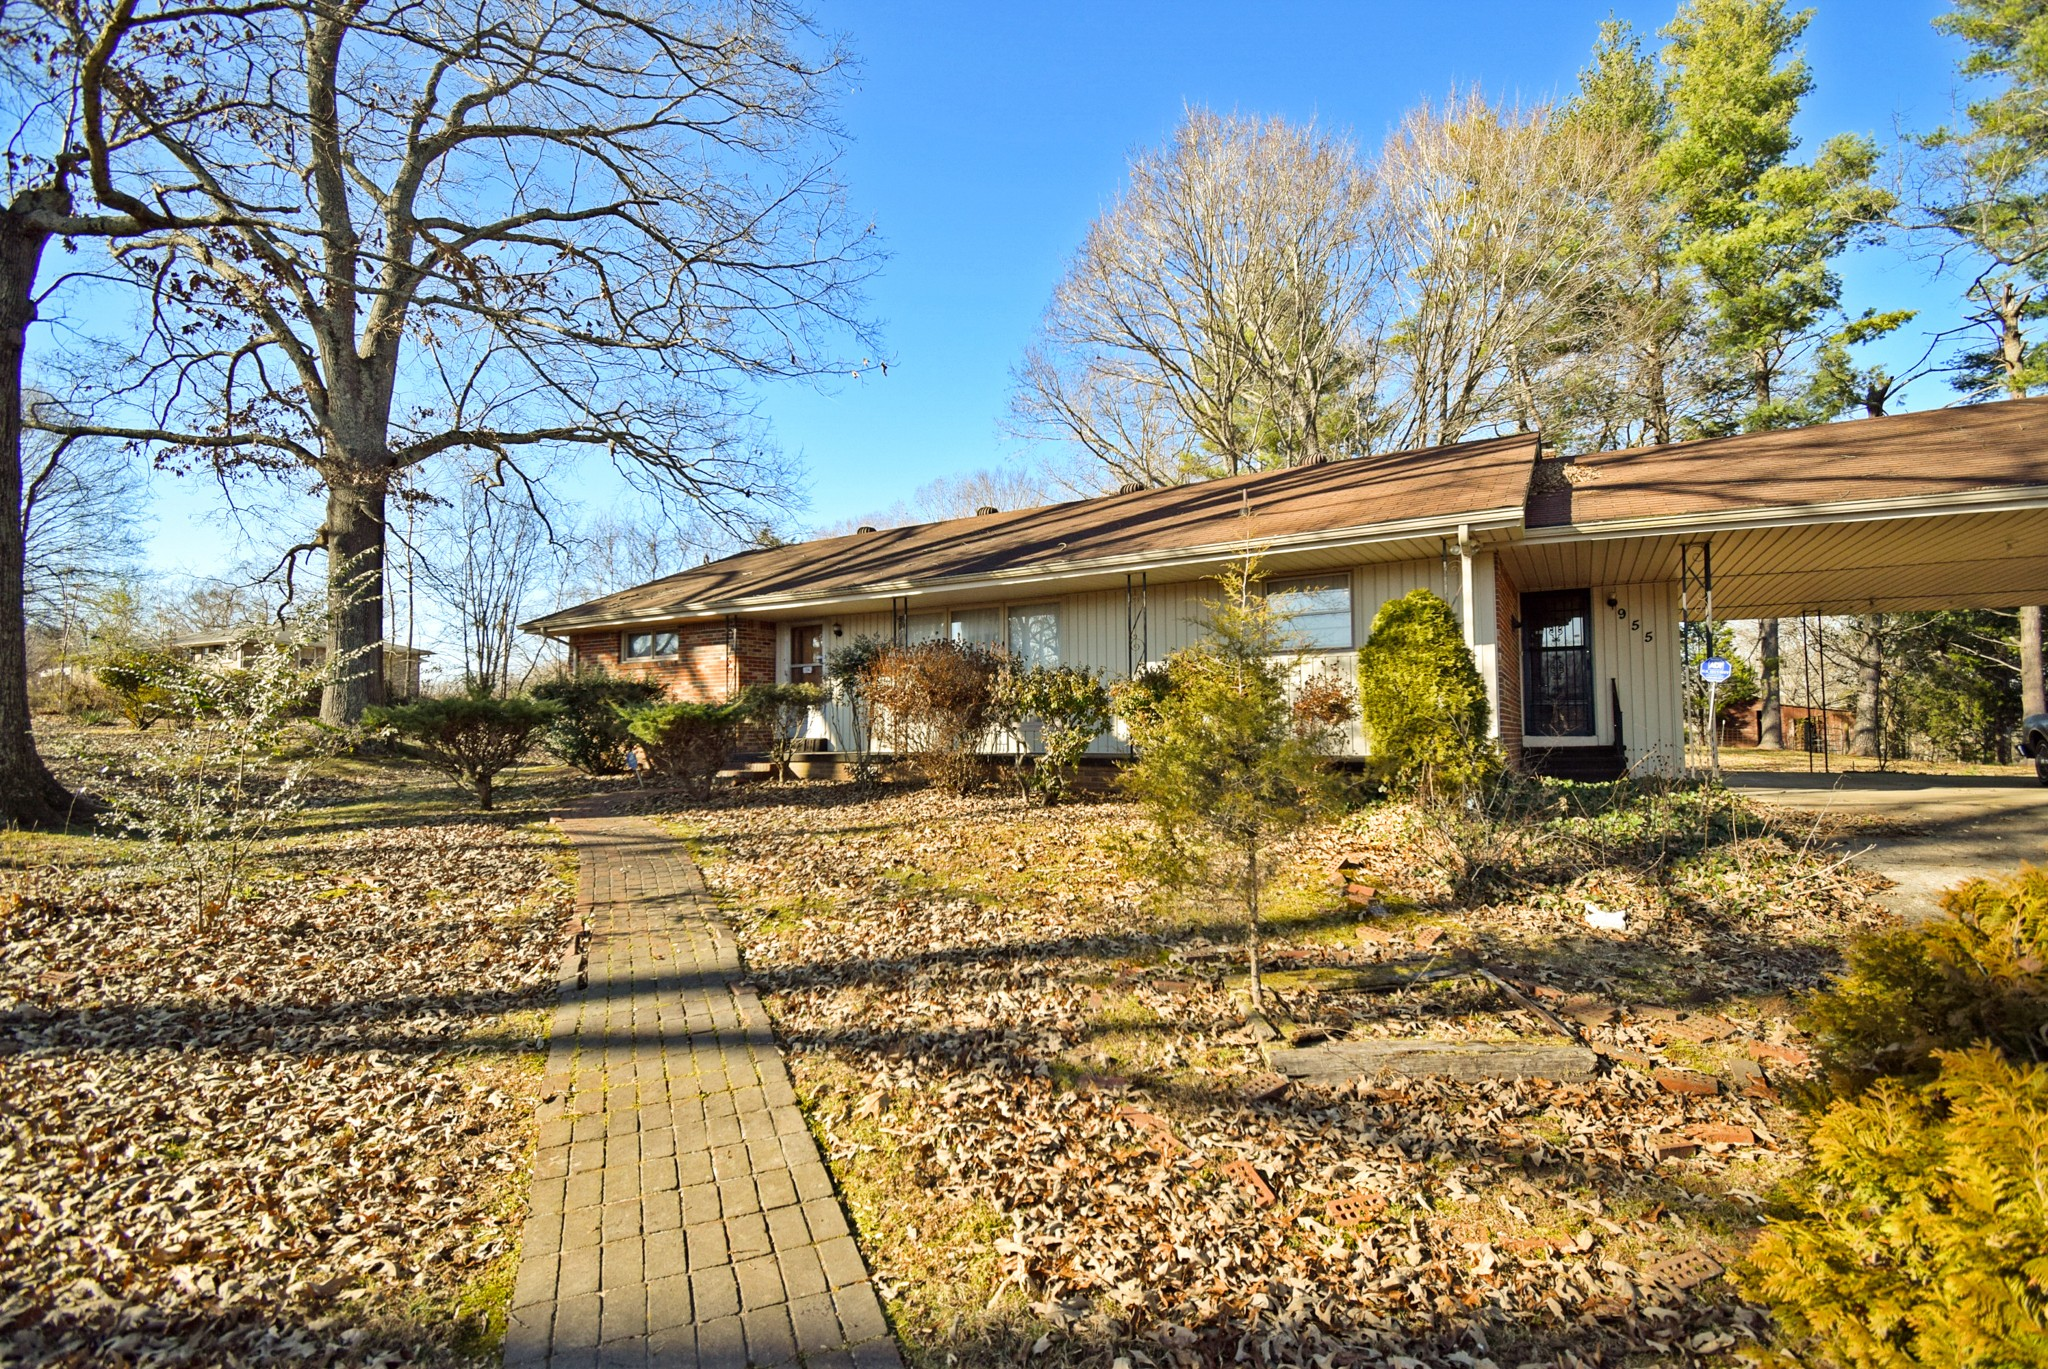 955 Belmont Rd, Clarksville, TN 37040 - Clarksville, TN real estate listing